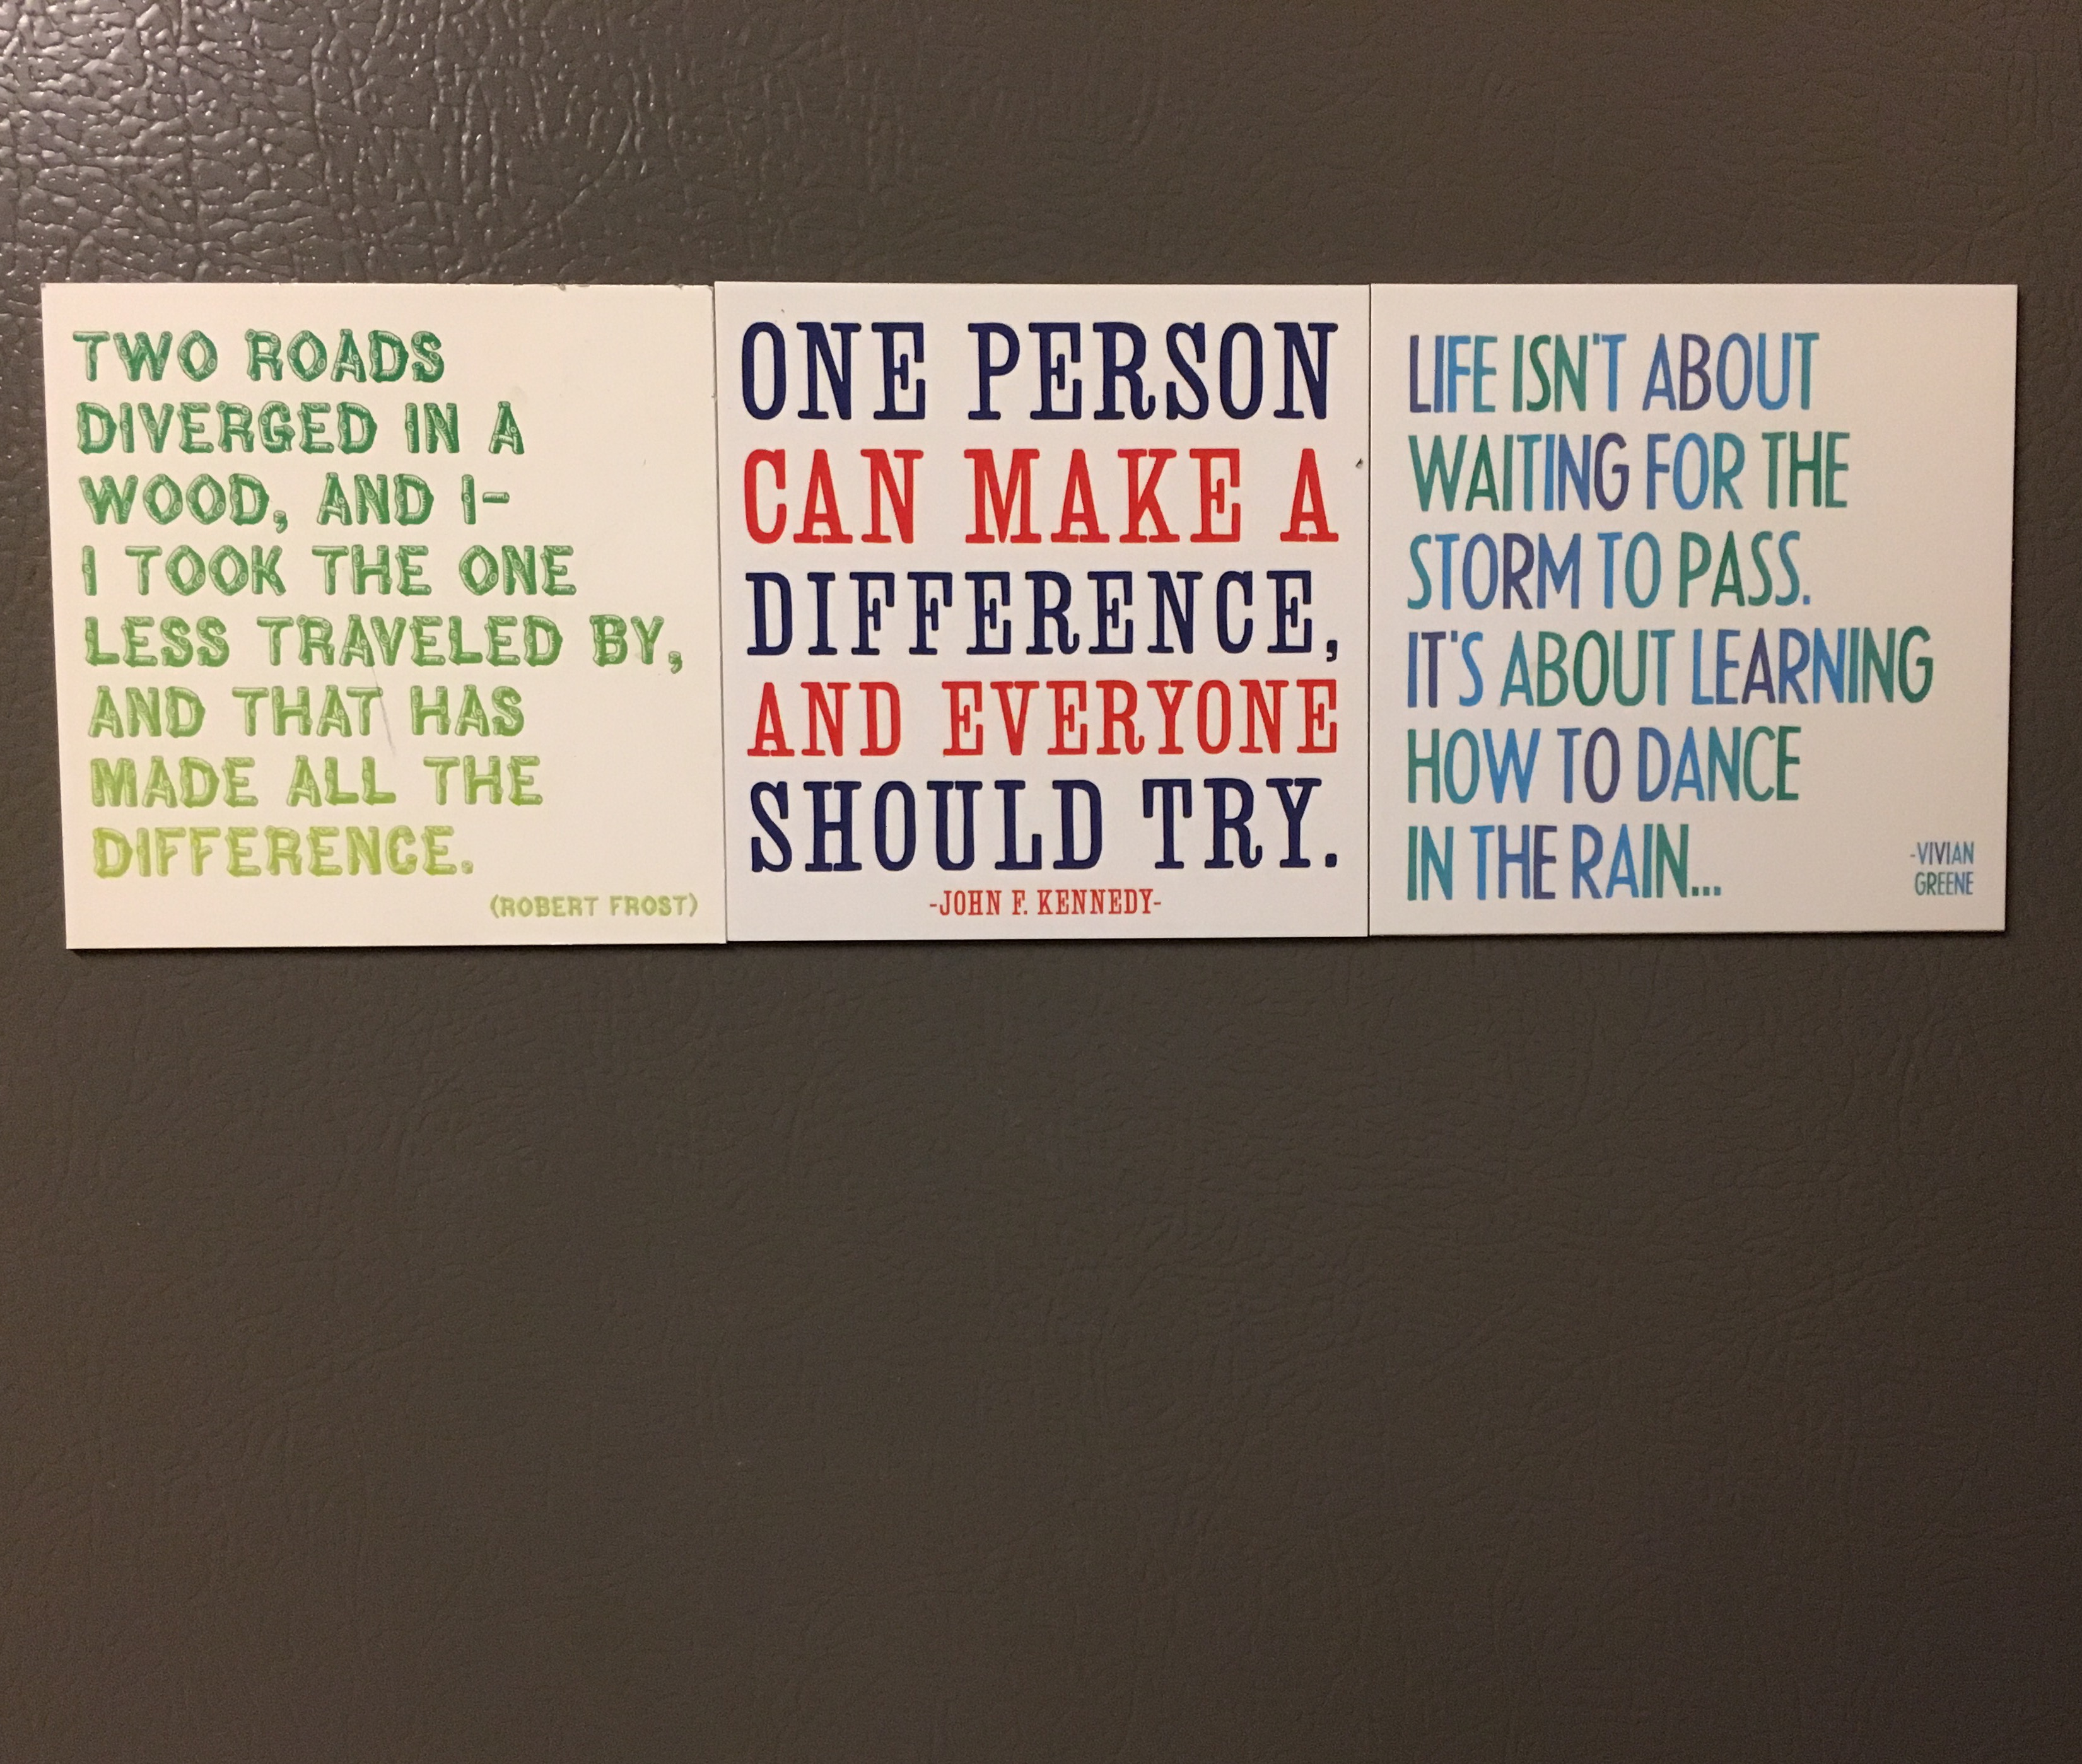 [Image] Fridge magnet wisdom